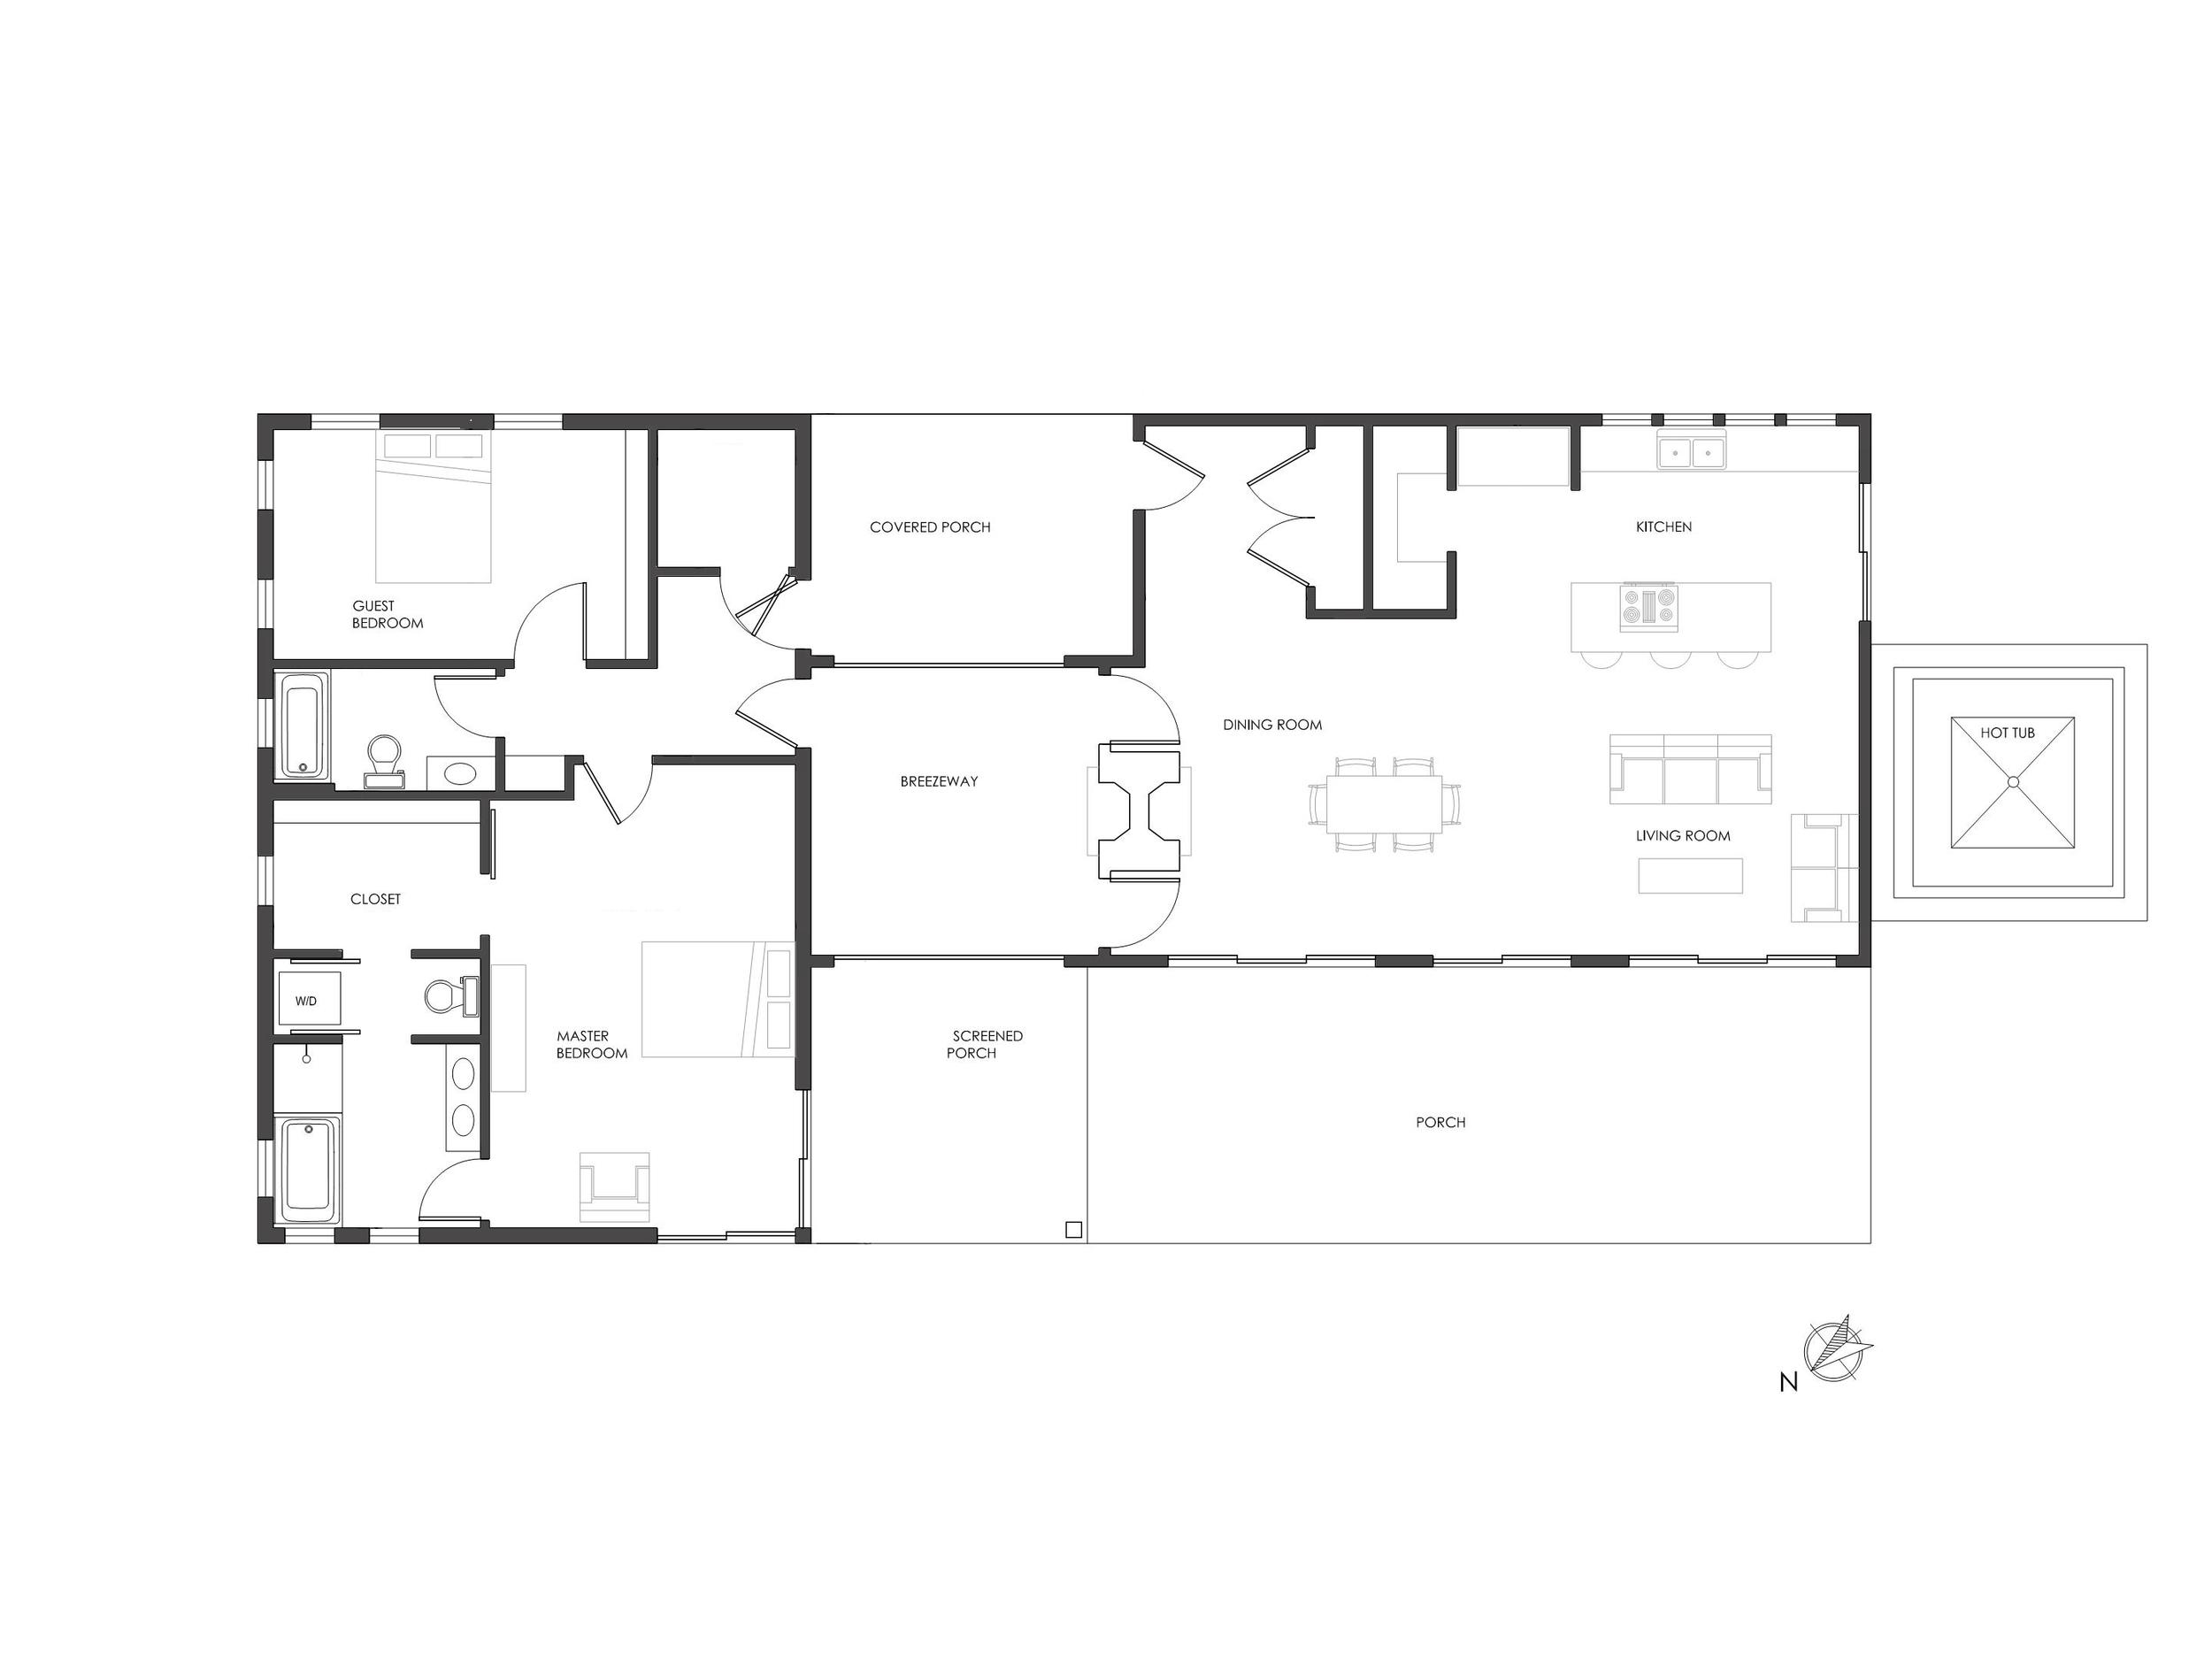 Cottage_plan final 2.jpg